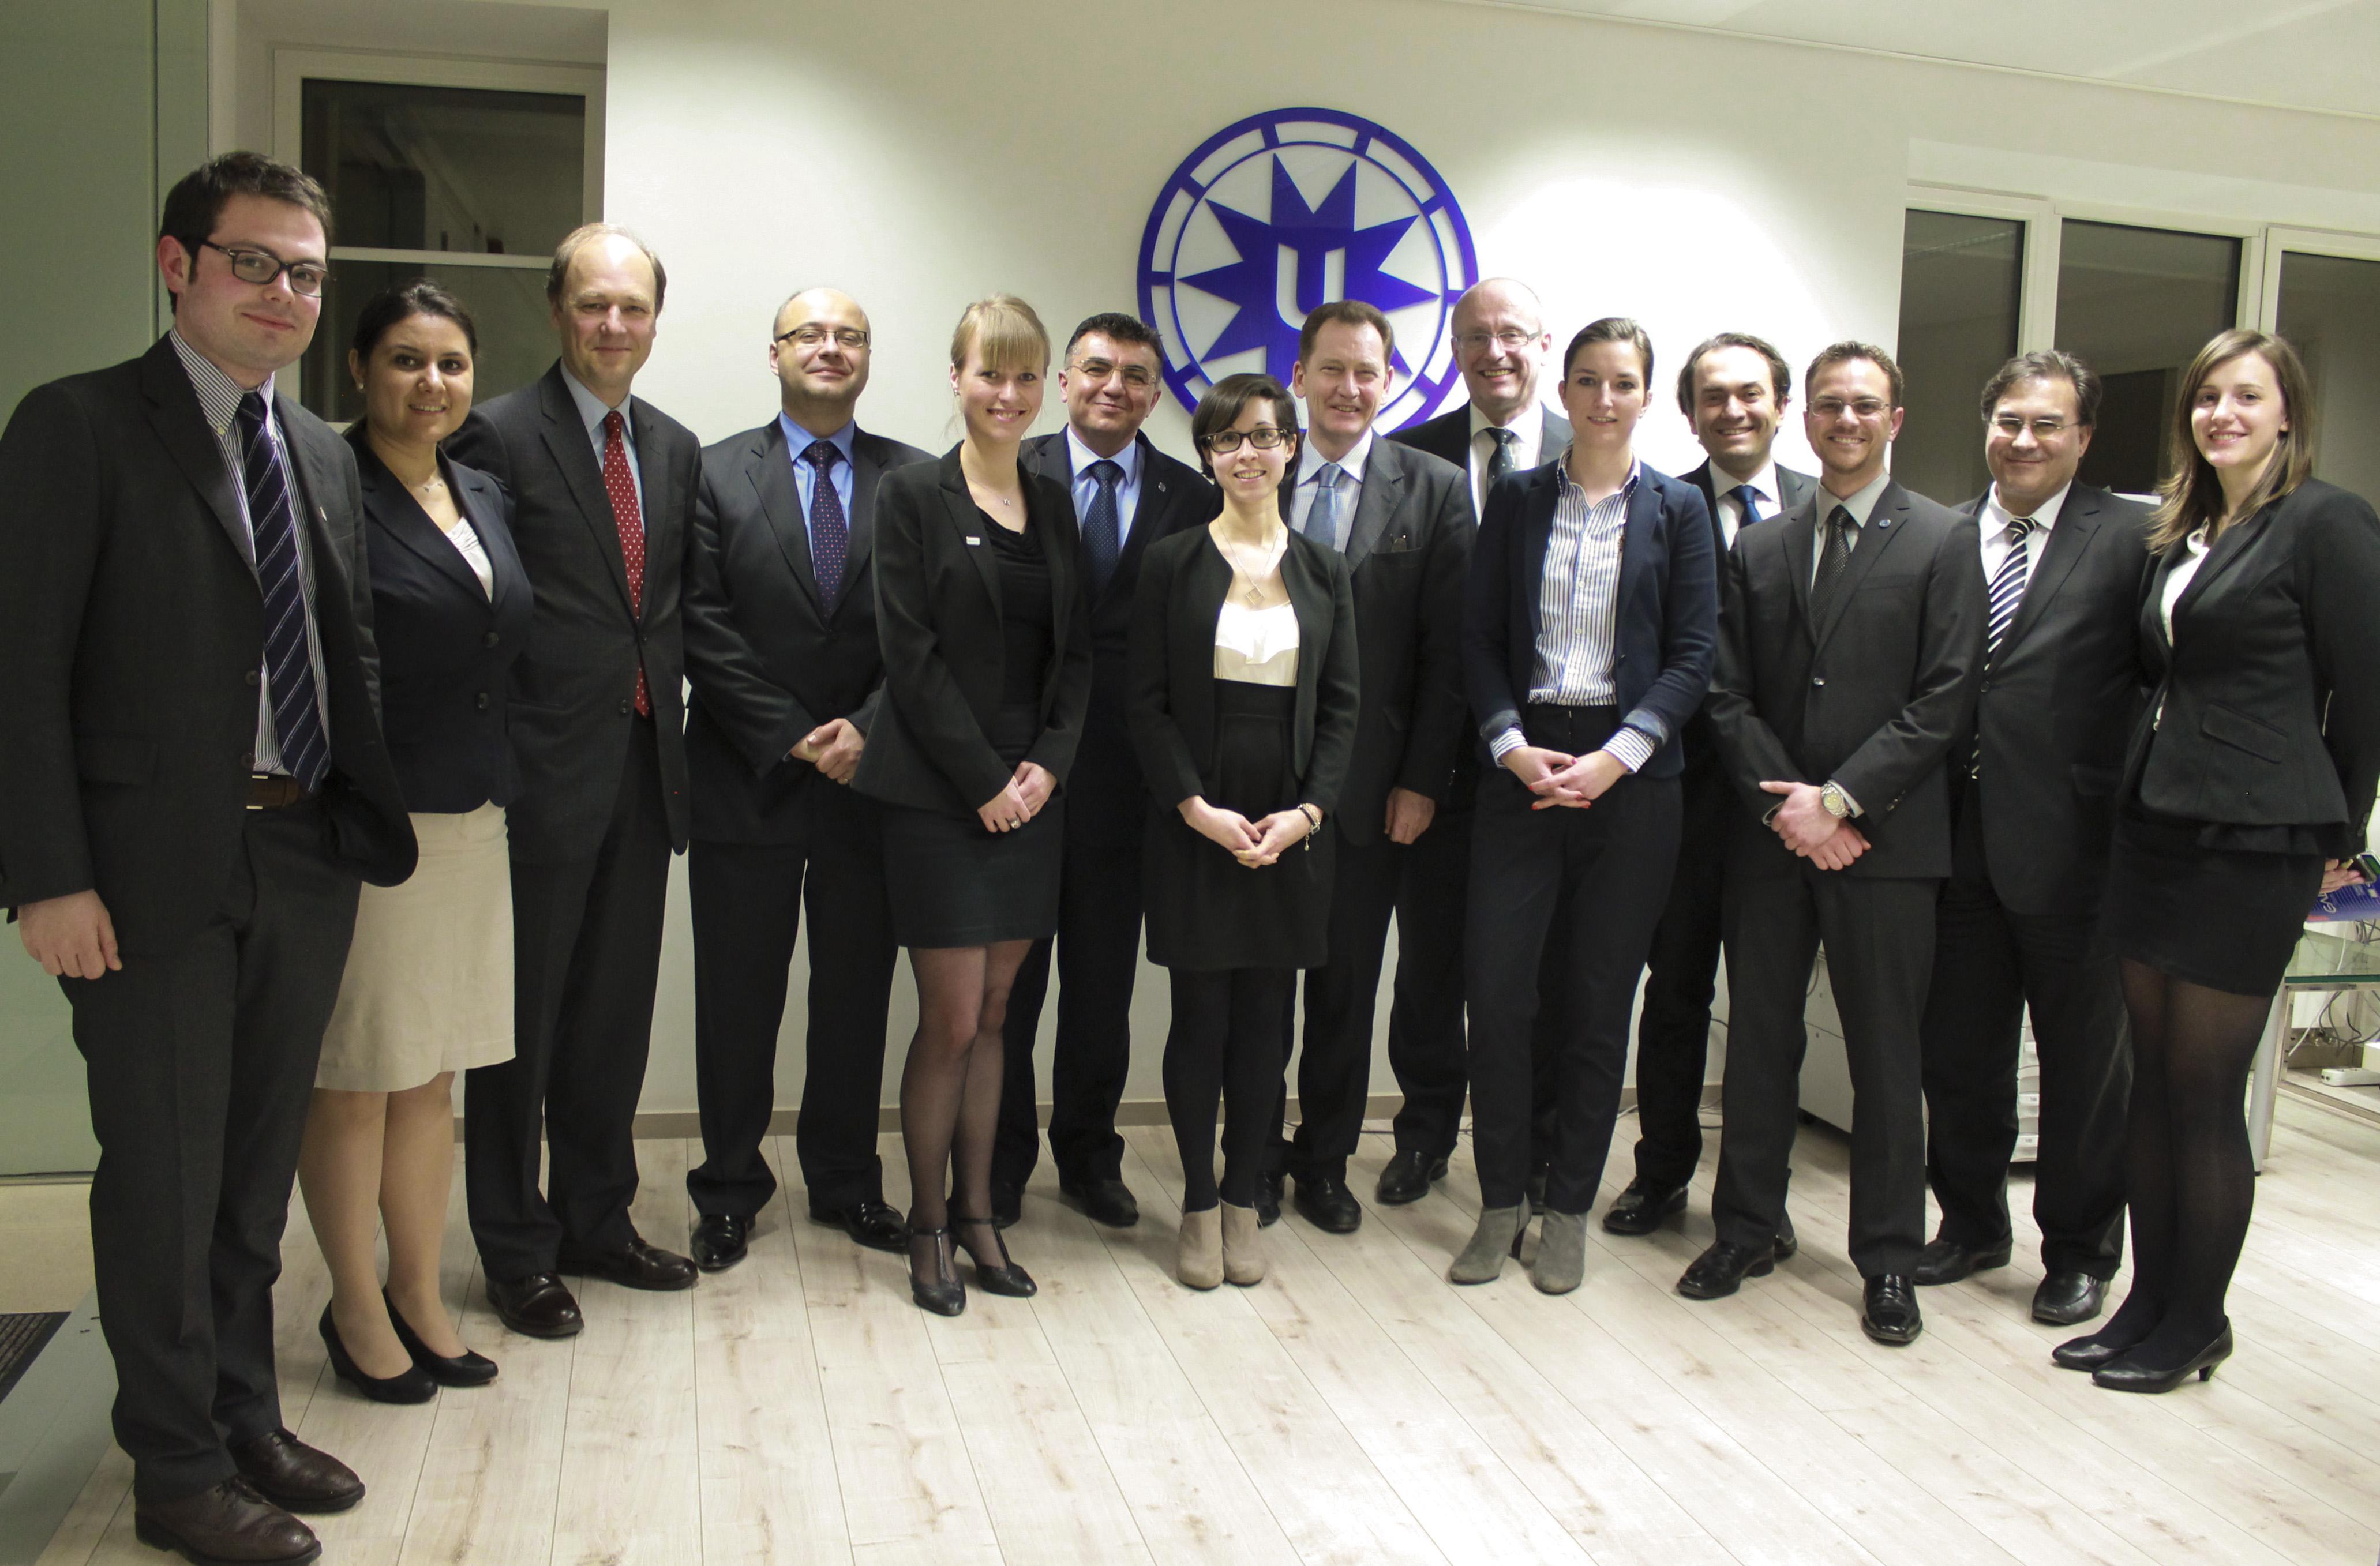 2013-03-20_Expert Roundtable_EU-Turkey Relations (1)